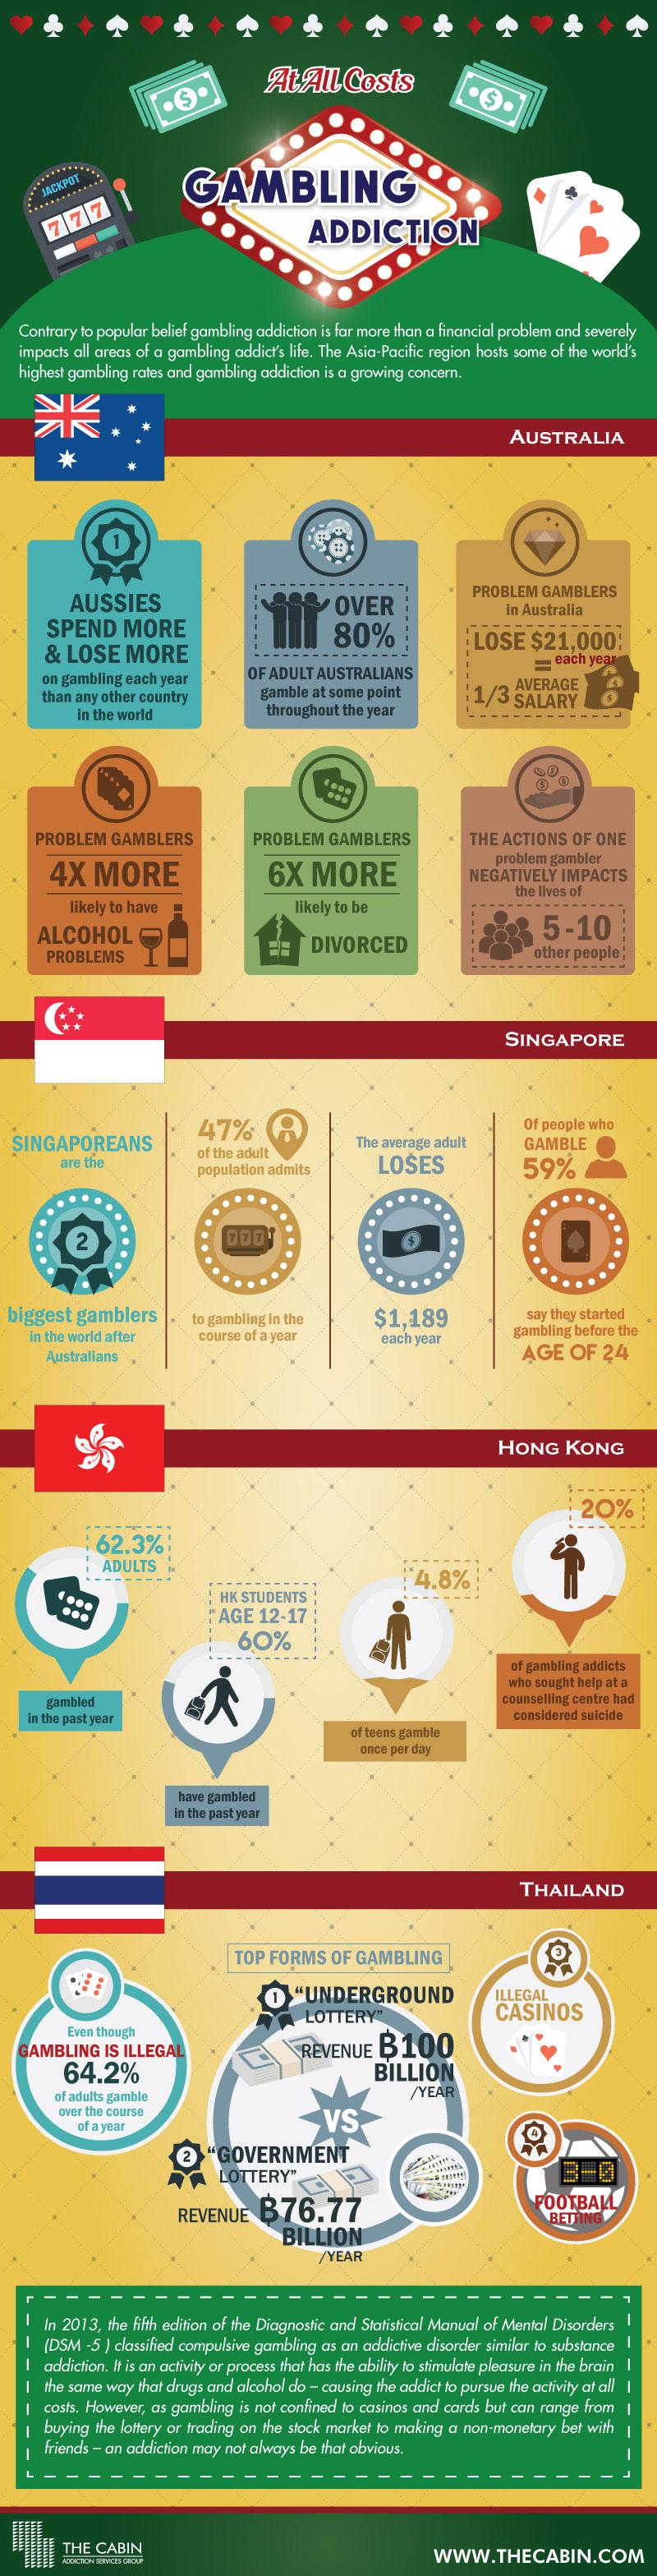 gambling across Asia-Pacific